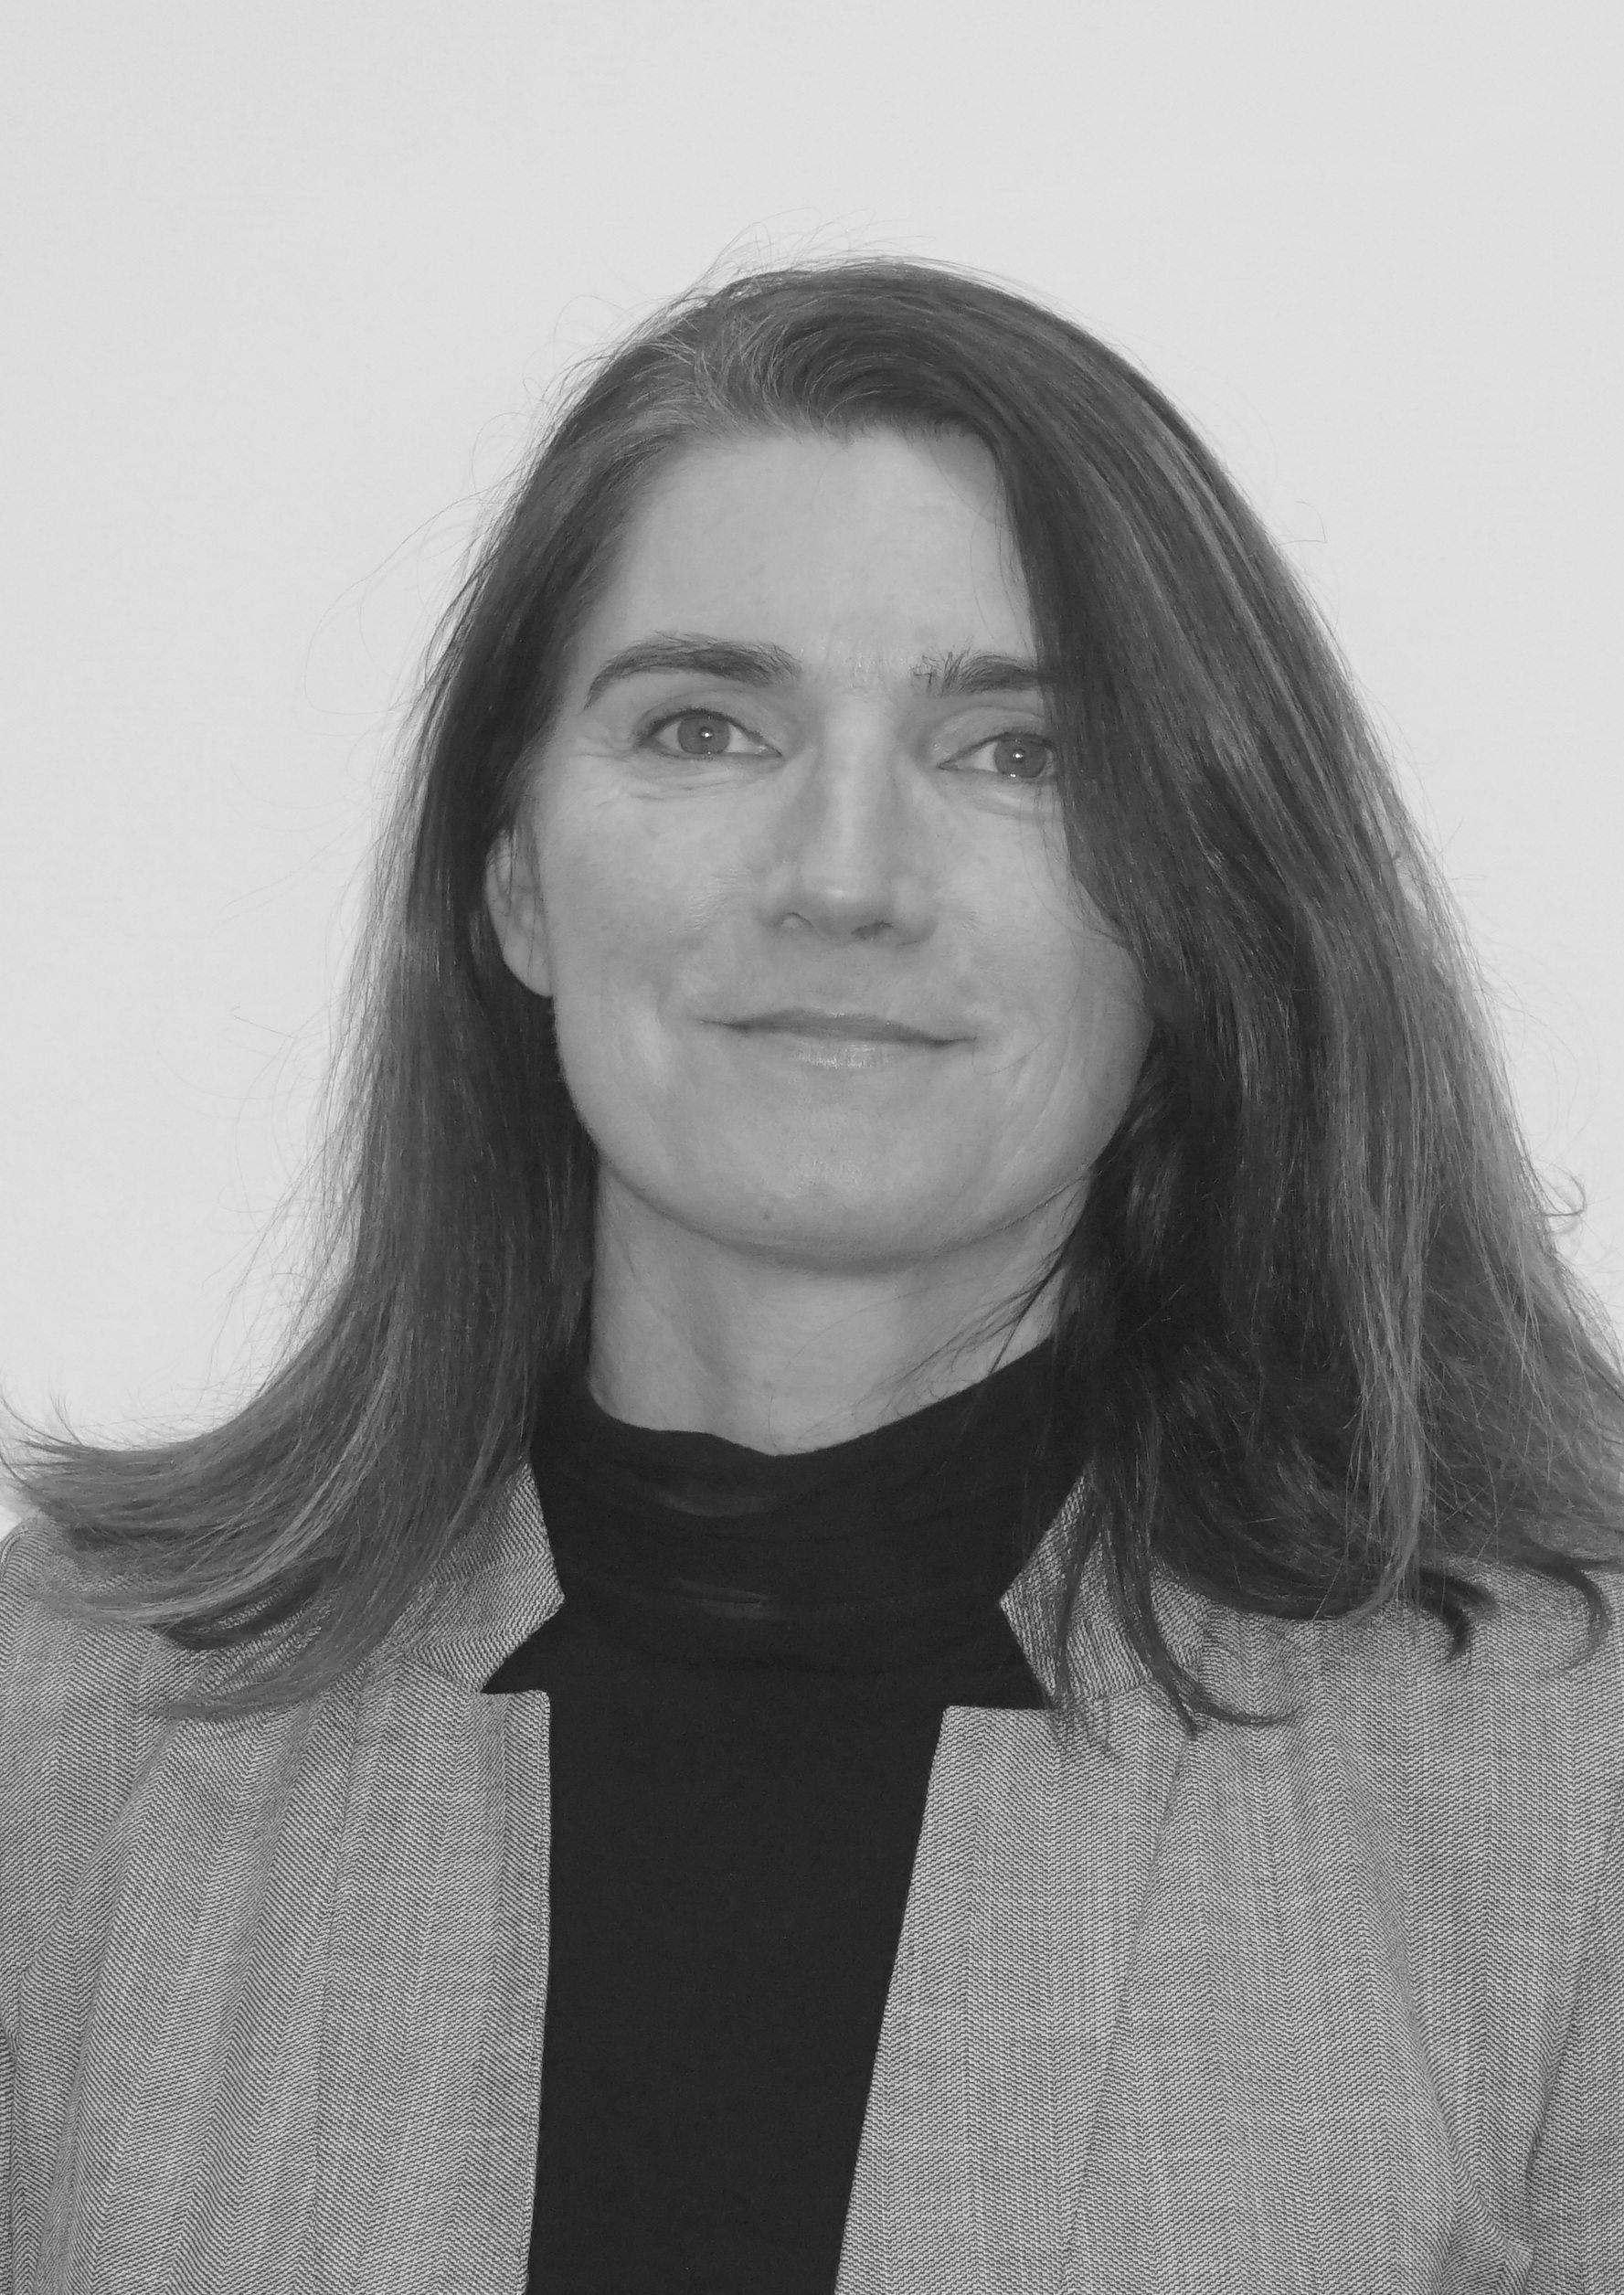 Laufey Birgisdóttir